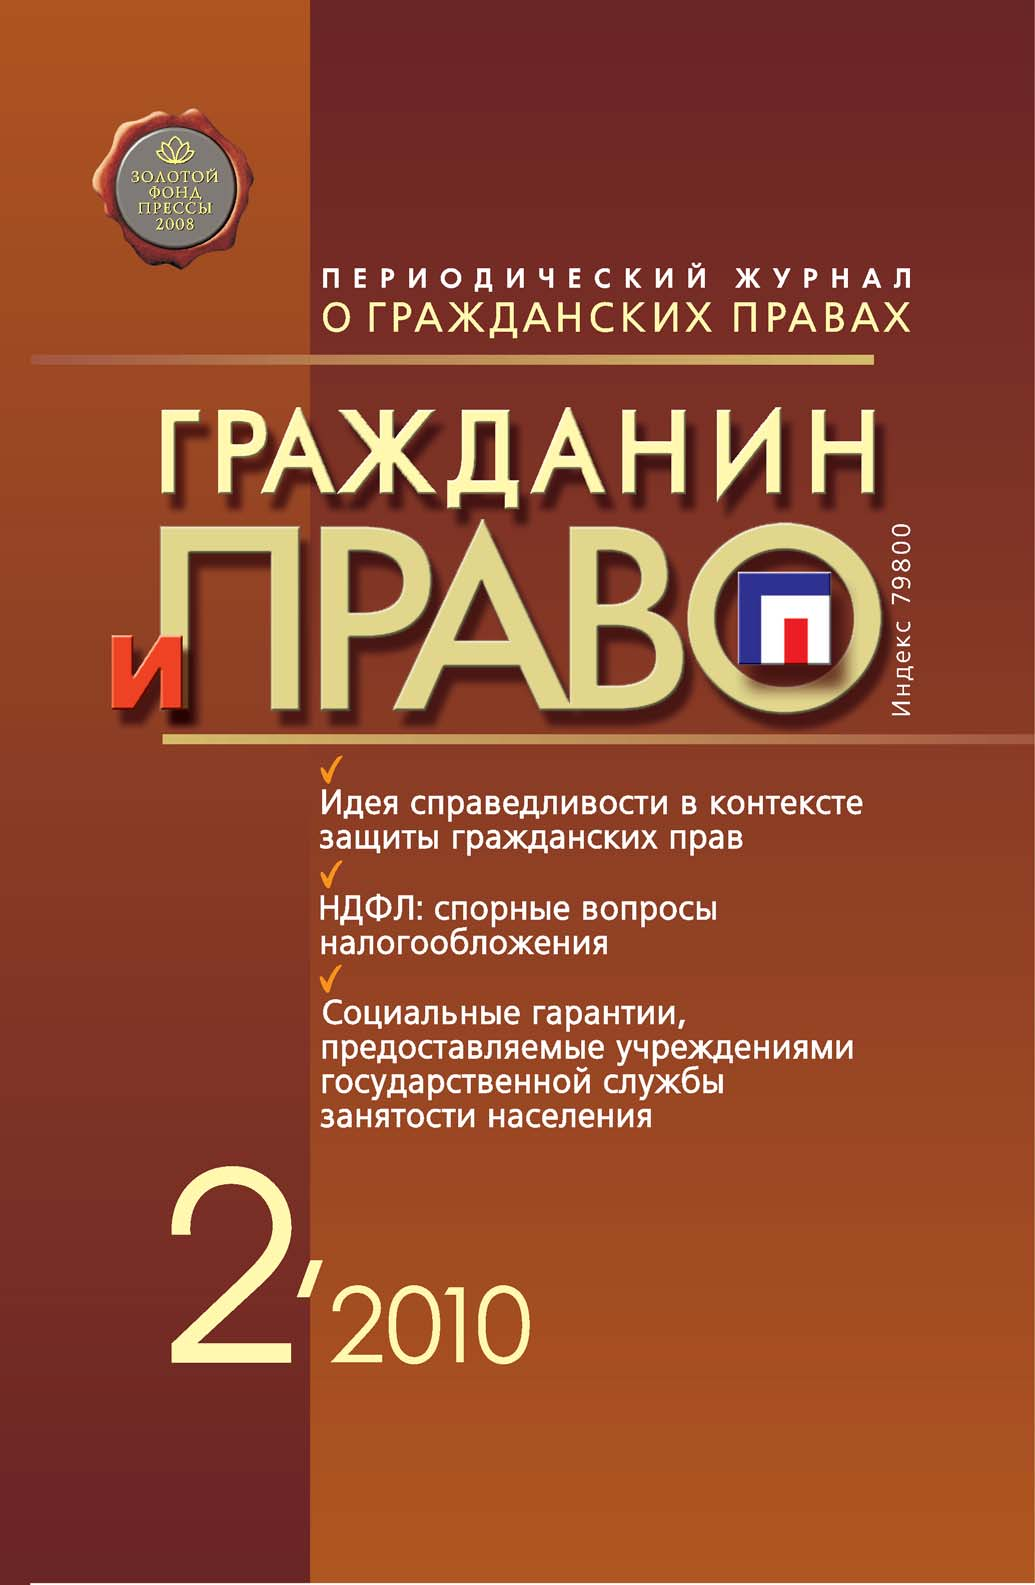 Гражданин и право №02/2010